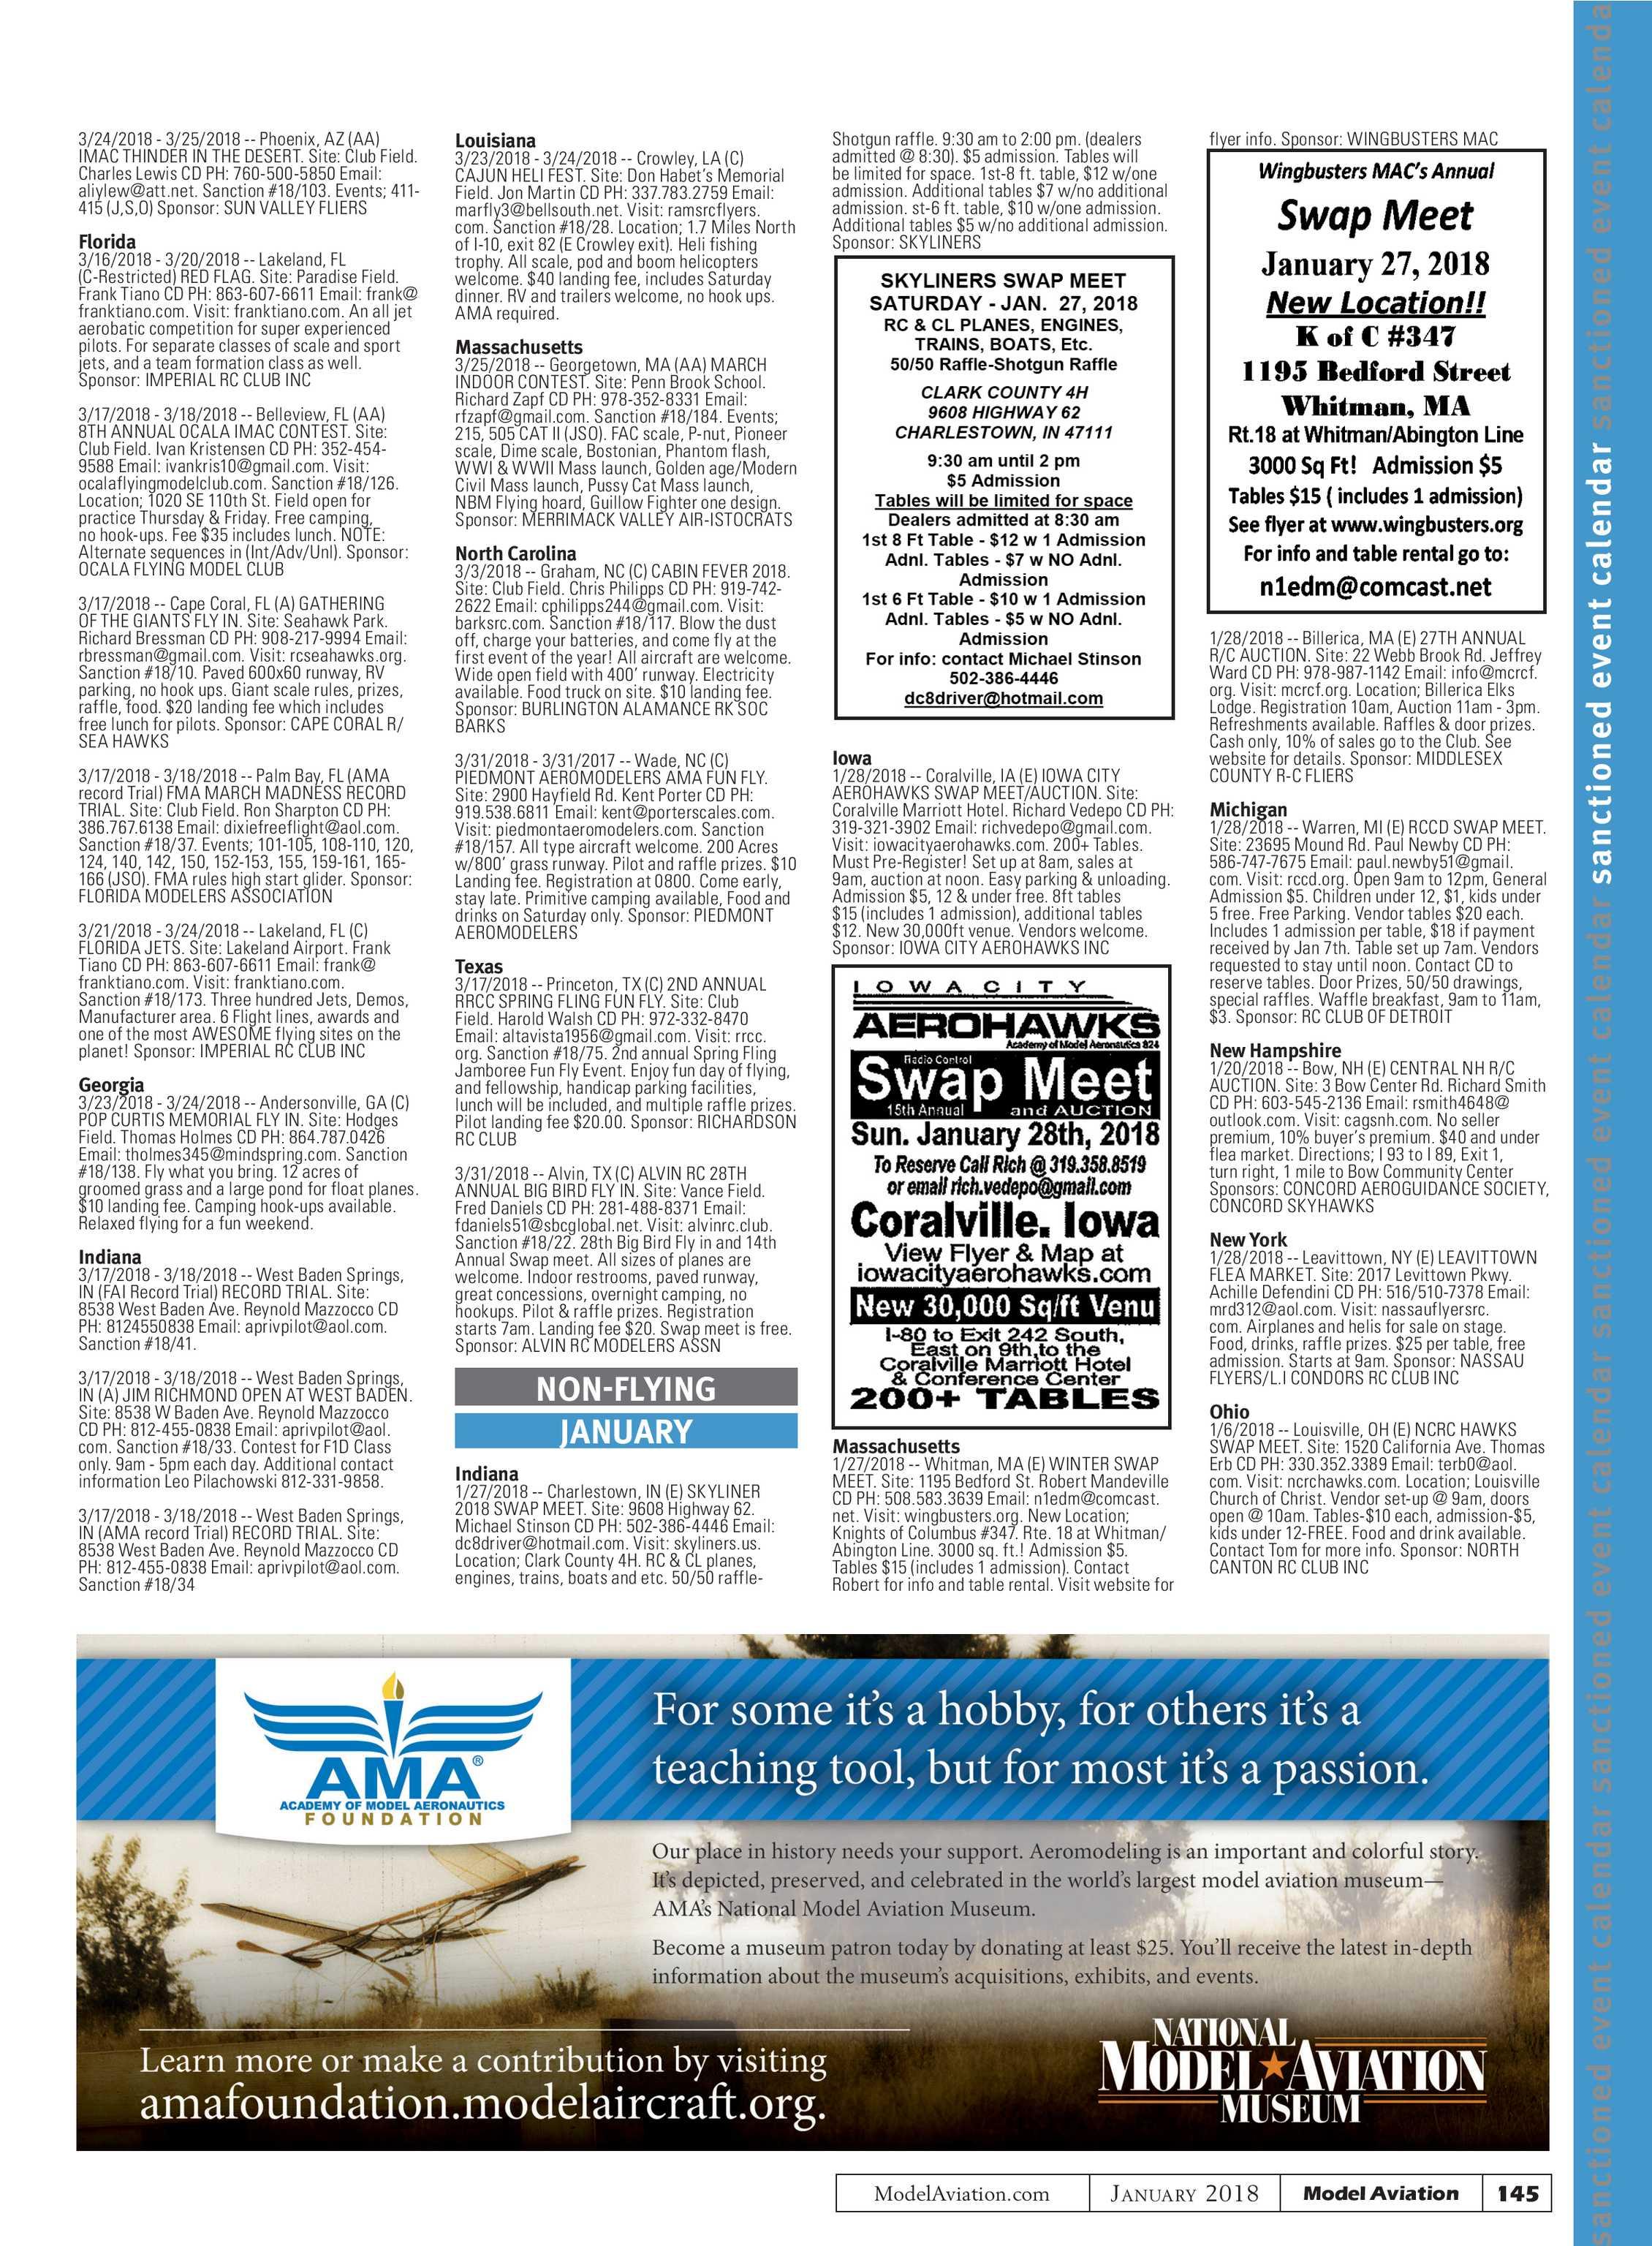 Model Aviation - January 2018 - page 144